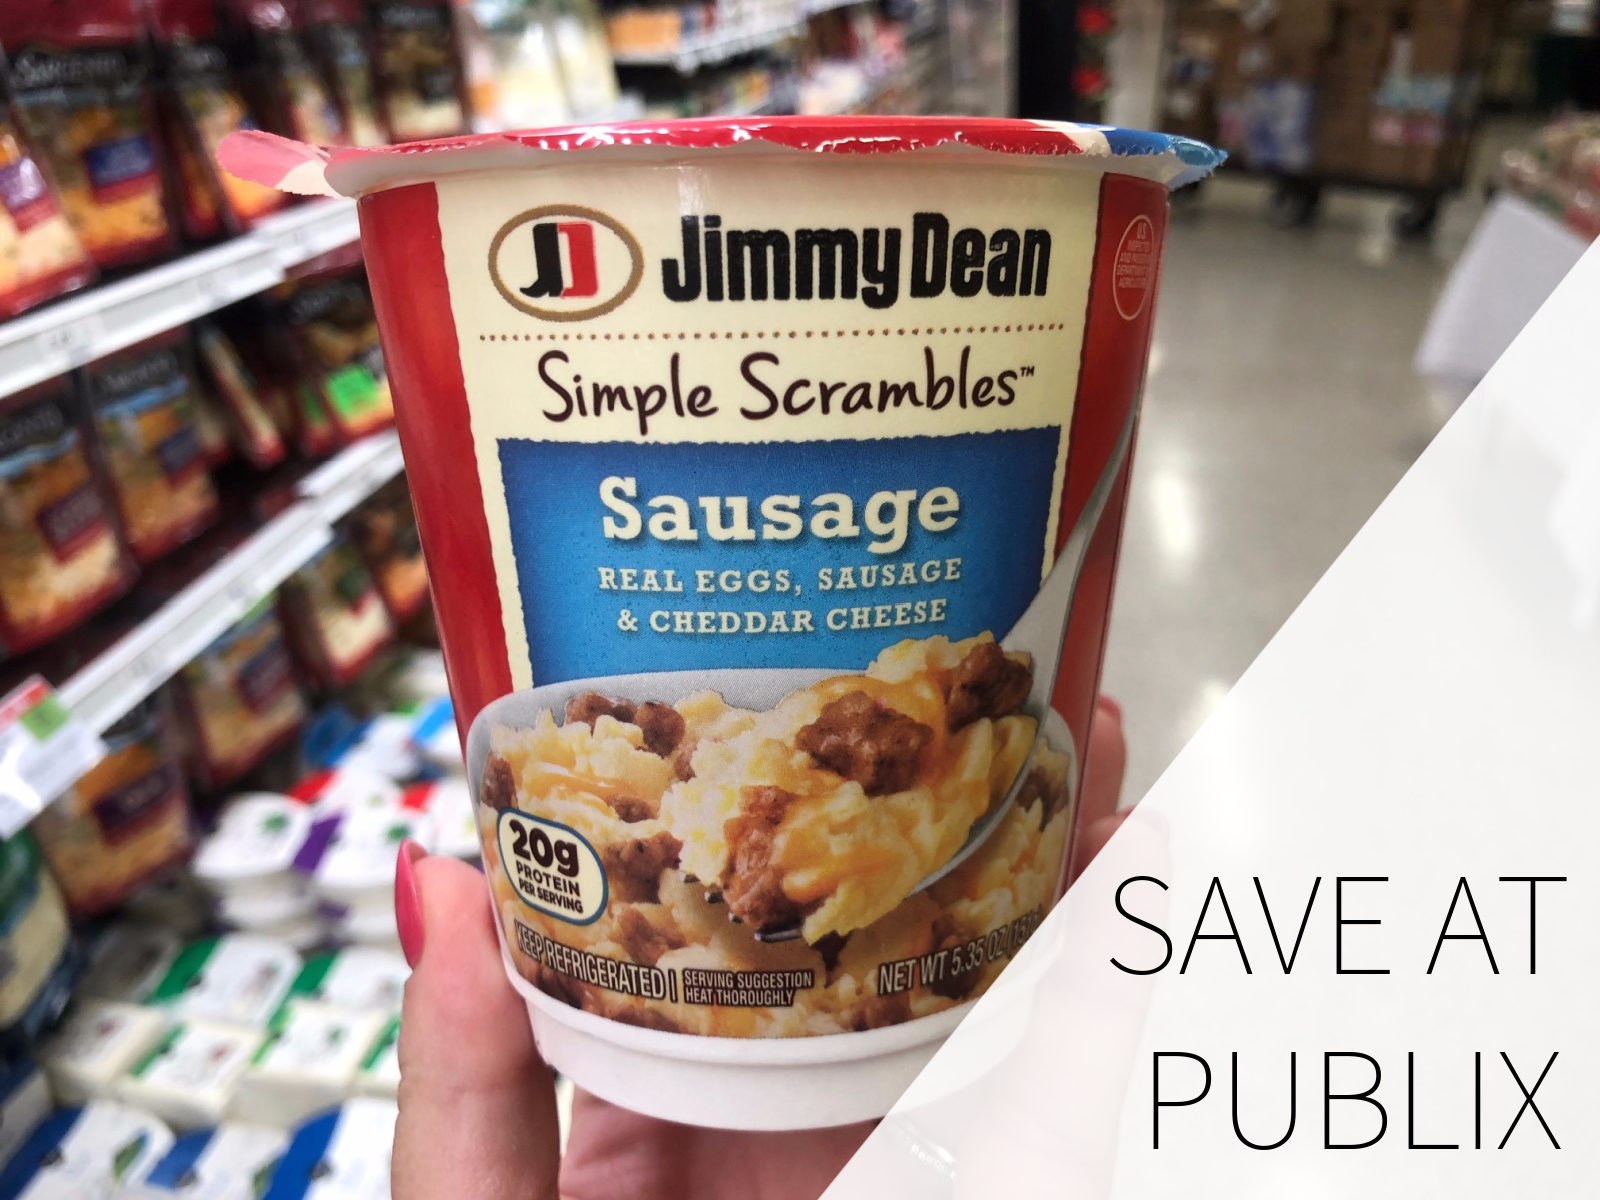 Save On Delicious & Convenient Jimmy Dean Simple Scrambles® Breakfast Cups At Publix on I Heart Publix